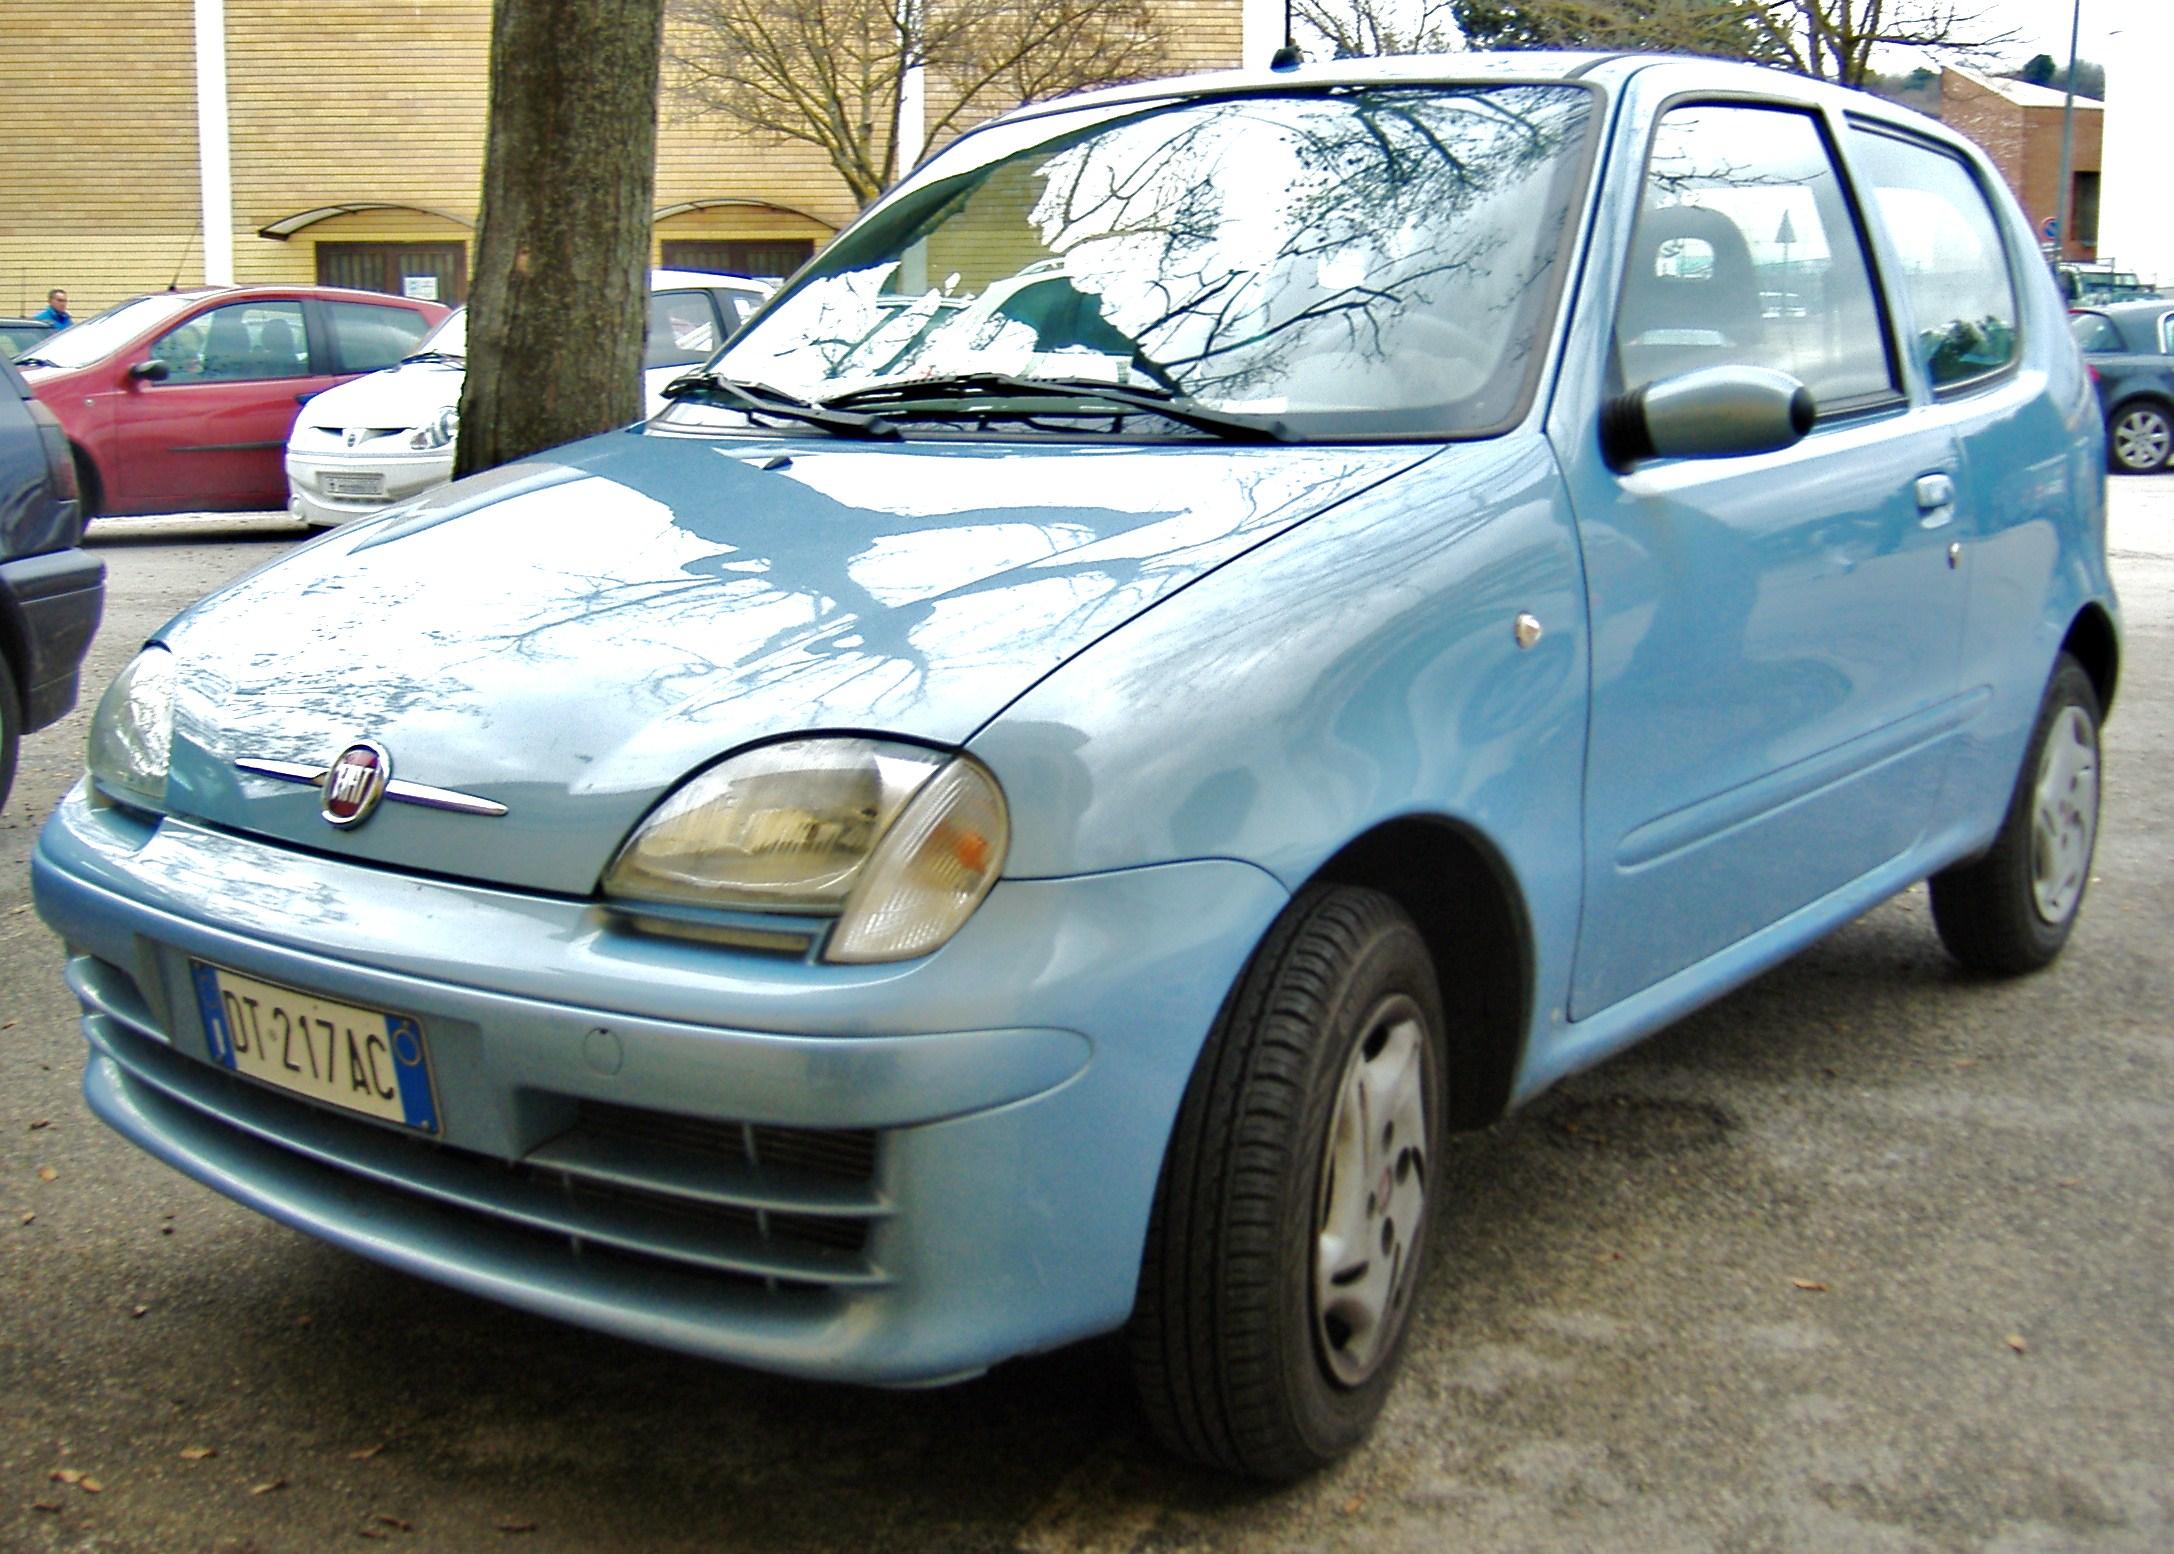 FIAT 600 blue